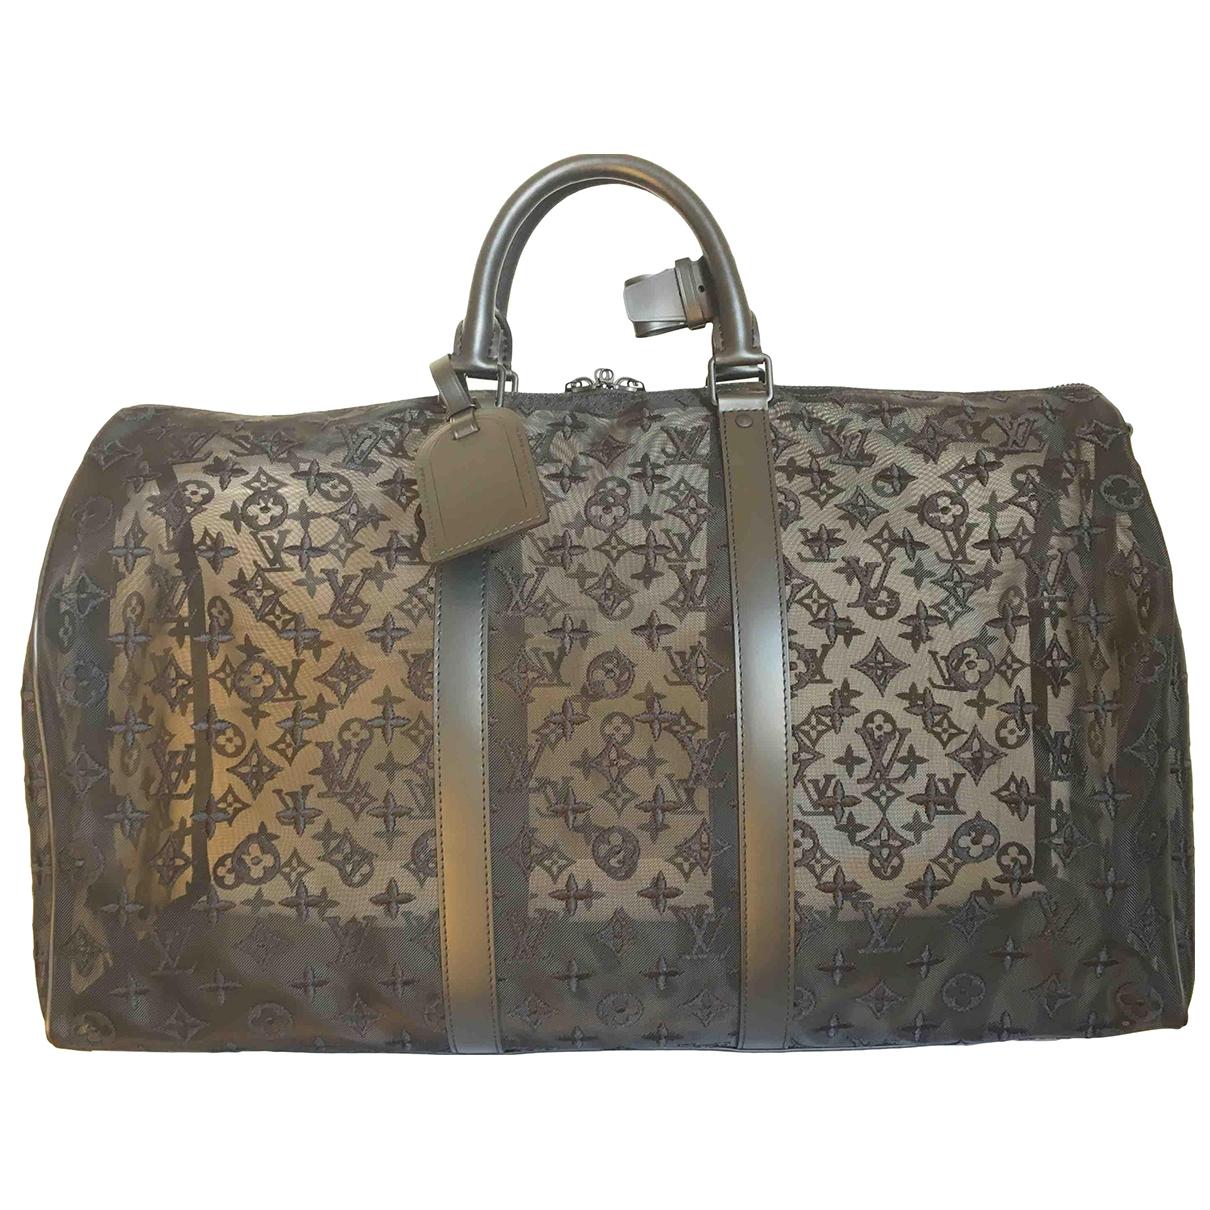 Louis Vuitton Keepall Black bag for Men \N